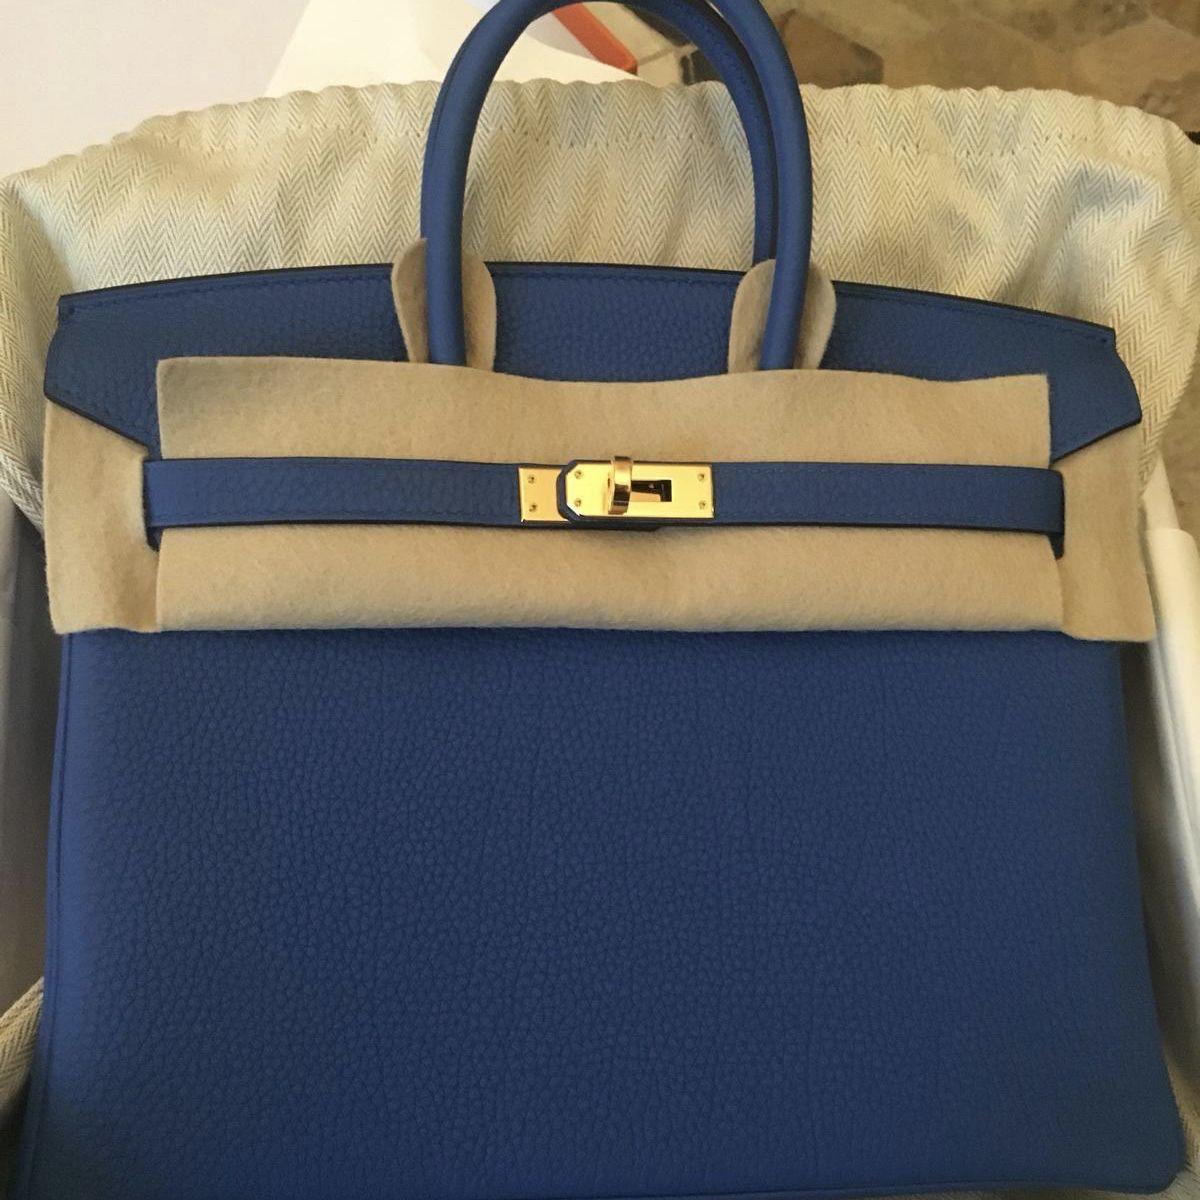 ac815e84705 Hermès Birkin 25 Bleu Zellige Togo Gold Hardware GHW C Stamp 2018  birkin25   thefrenchhunter  authenticonly  hermesworld  hermesusa  hermeseurope ...